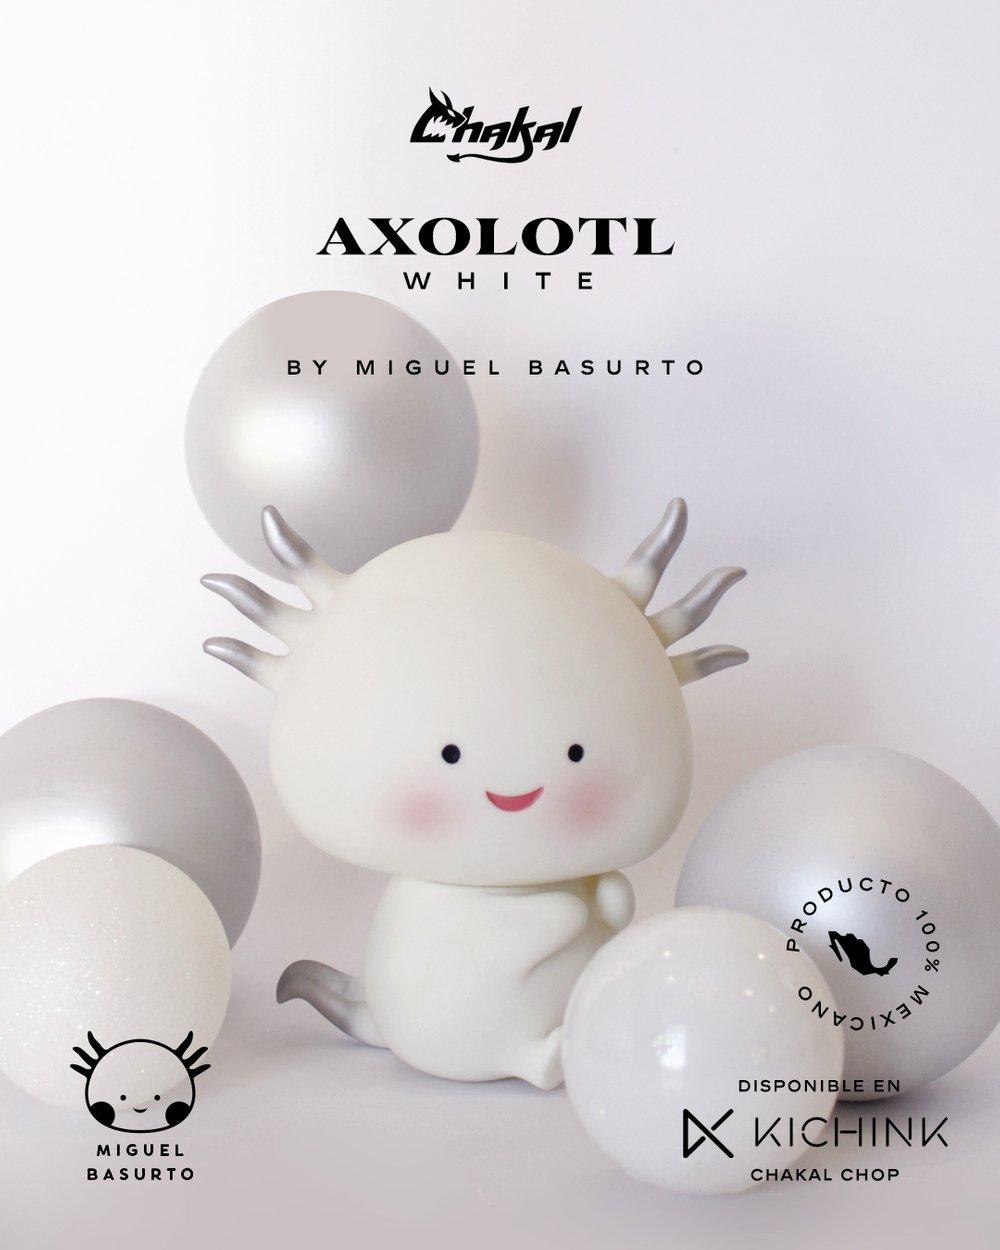 Axolotl Blanco y Negro Chakaltoys Miguel Basurto